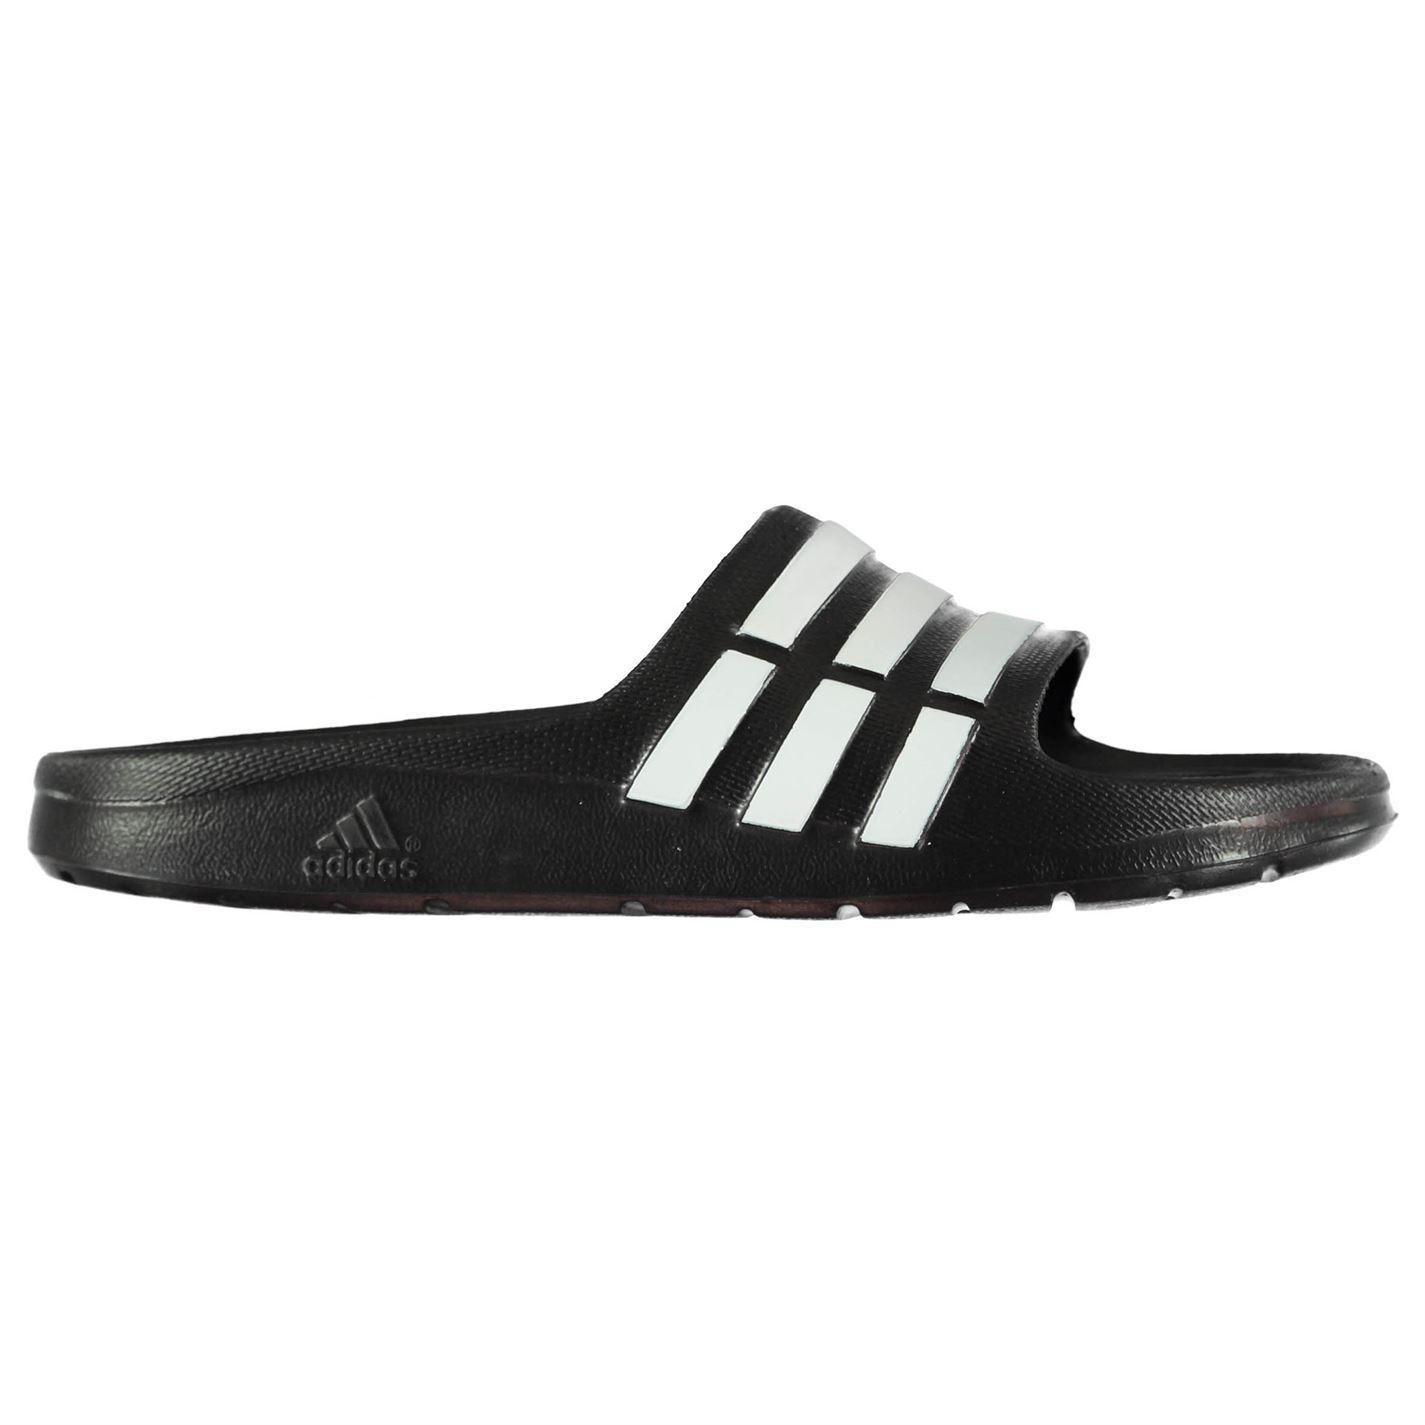 miniatura 3 - ADIDAS-Duramo-Slide-Piscina-Scarpe-Bambino-Ragazzo-Sandali-Infradito-Spiaggia-Scarpe-Thongs